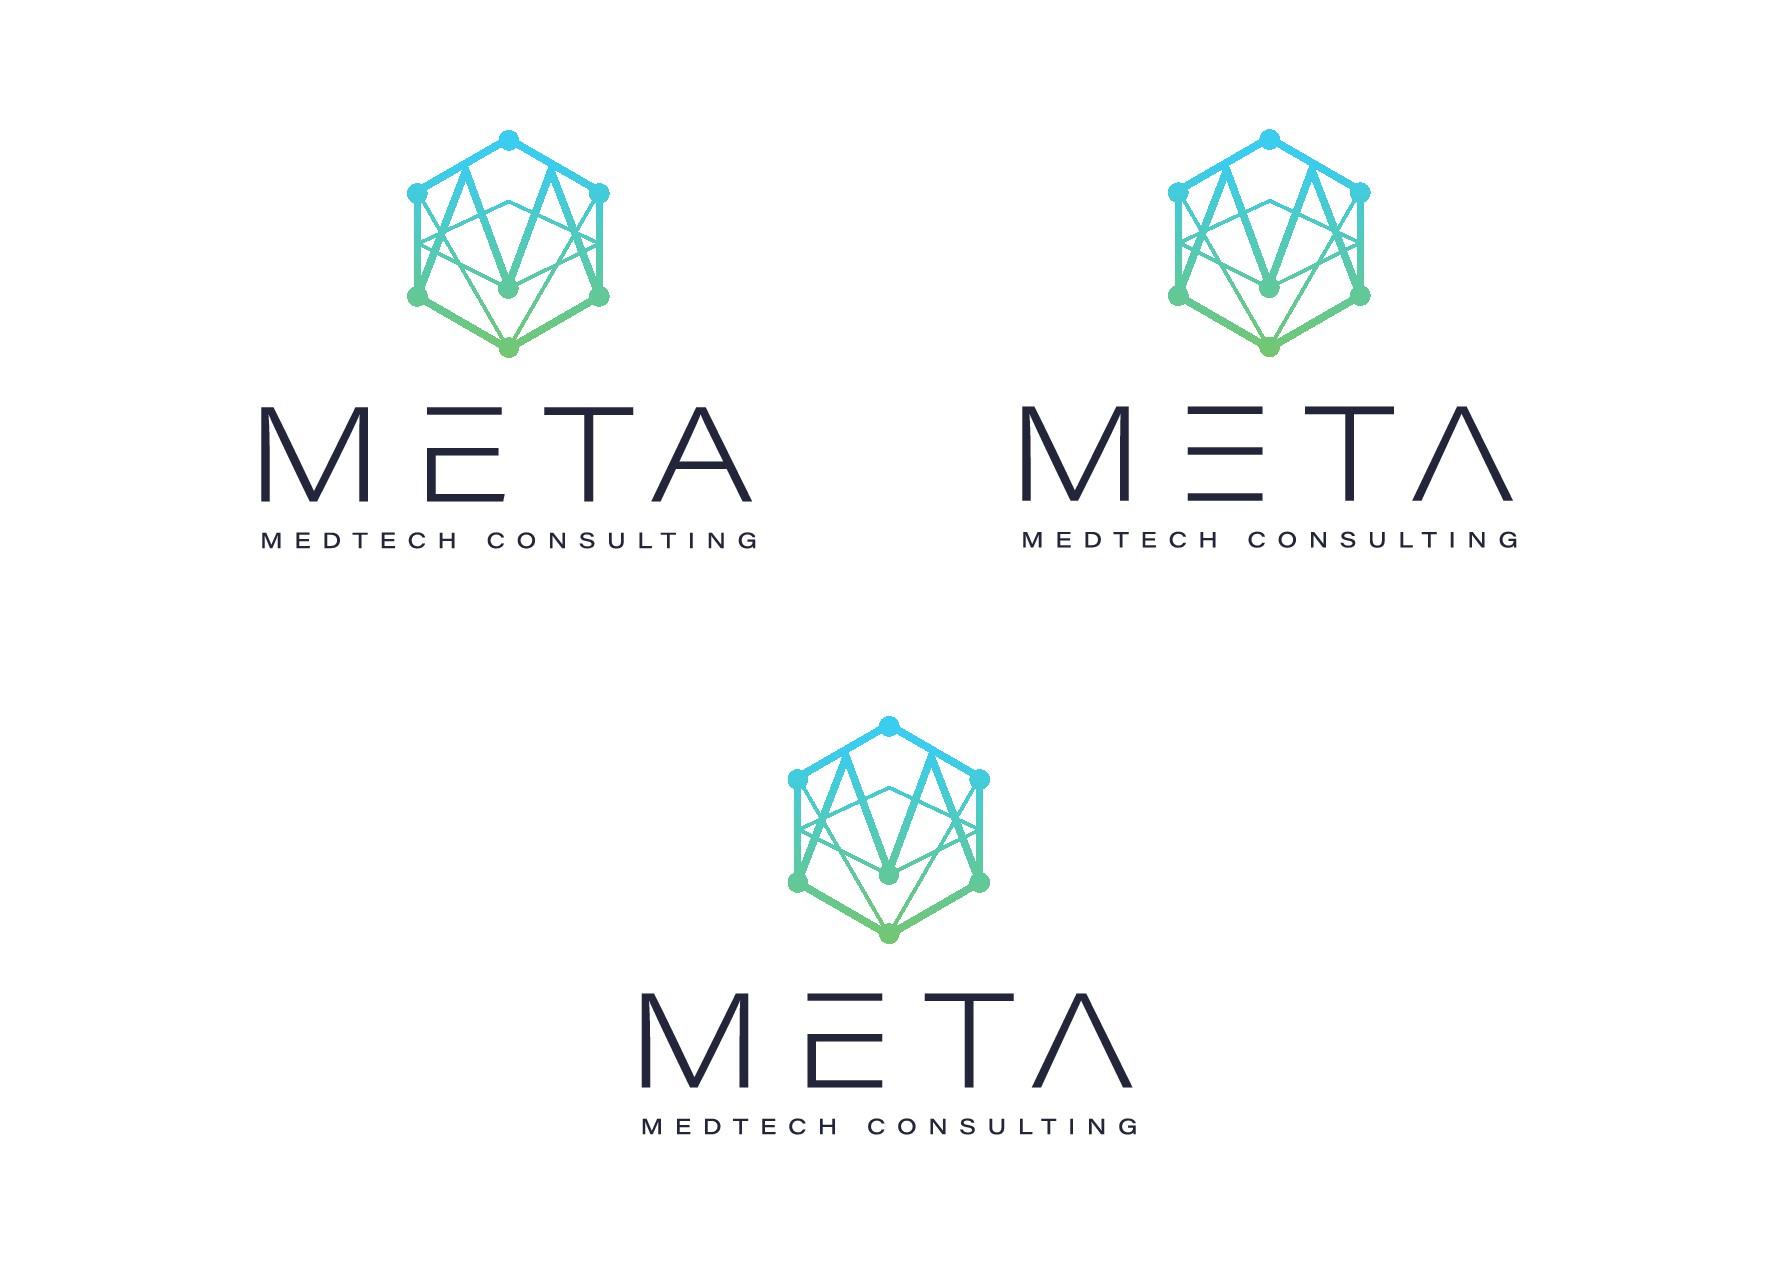 Meta consulting needs an innovative hi-tech logo